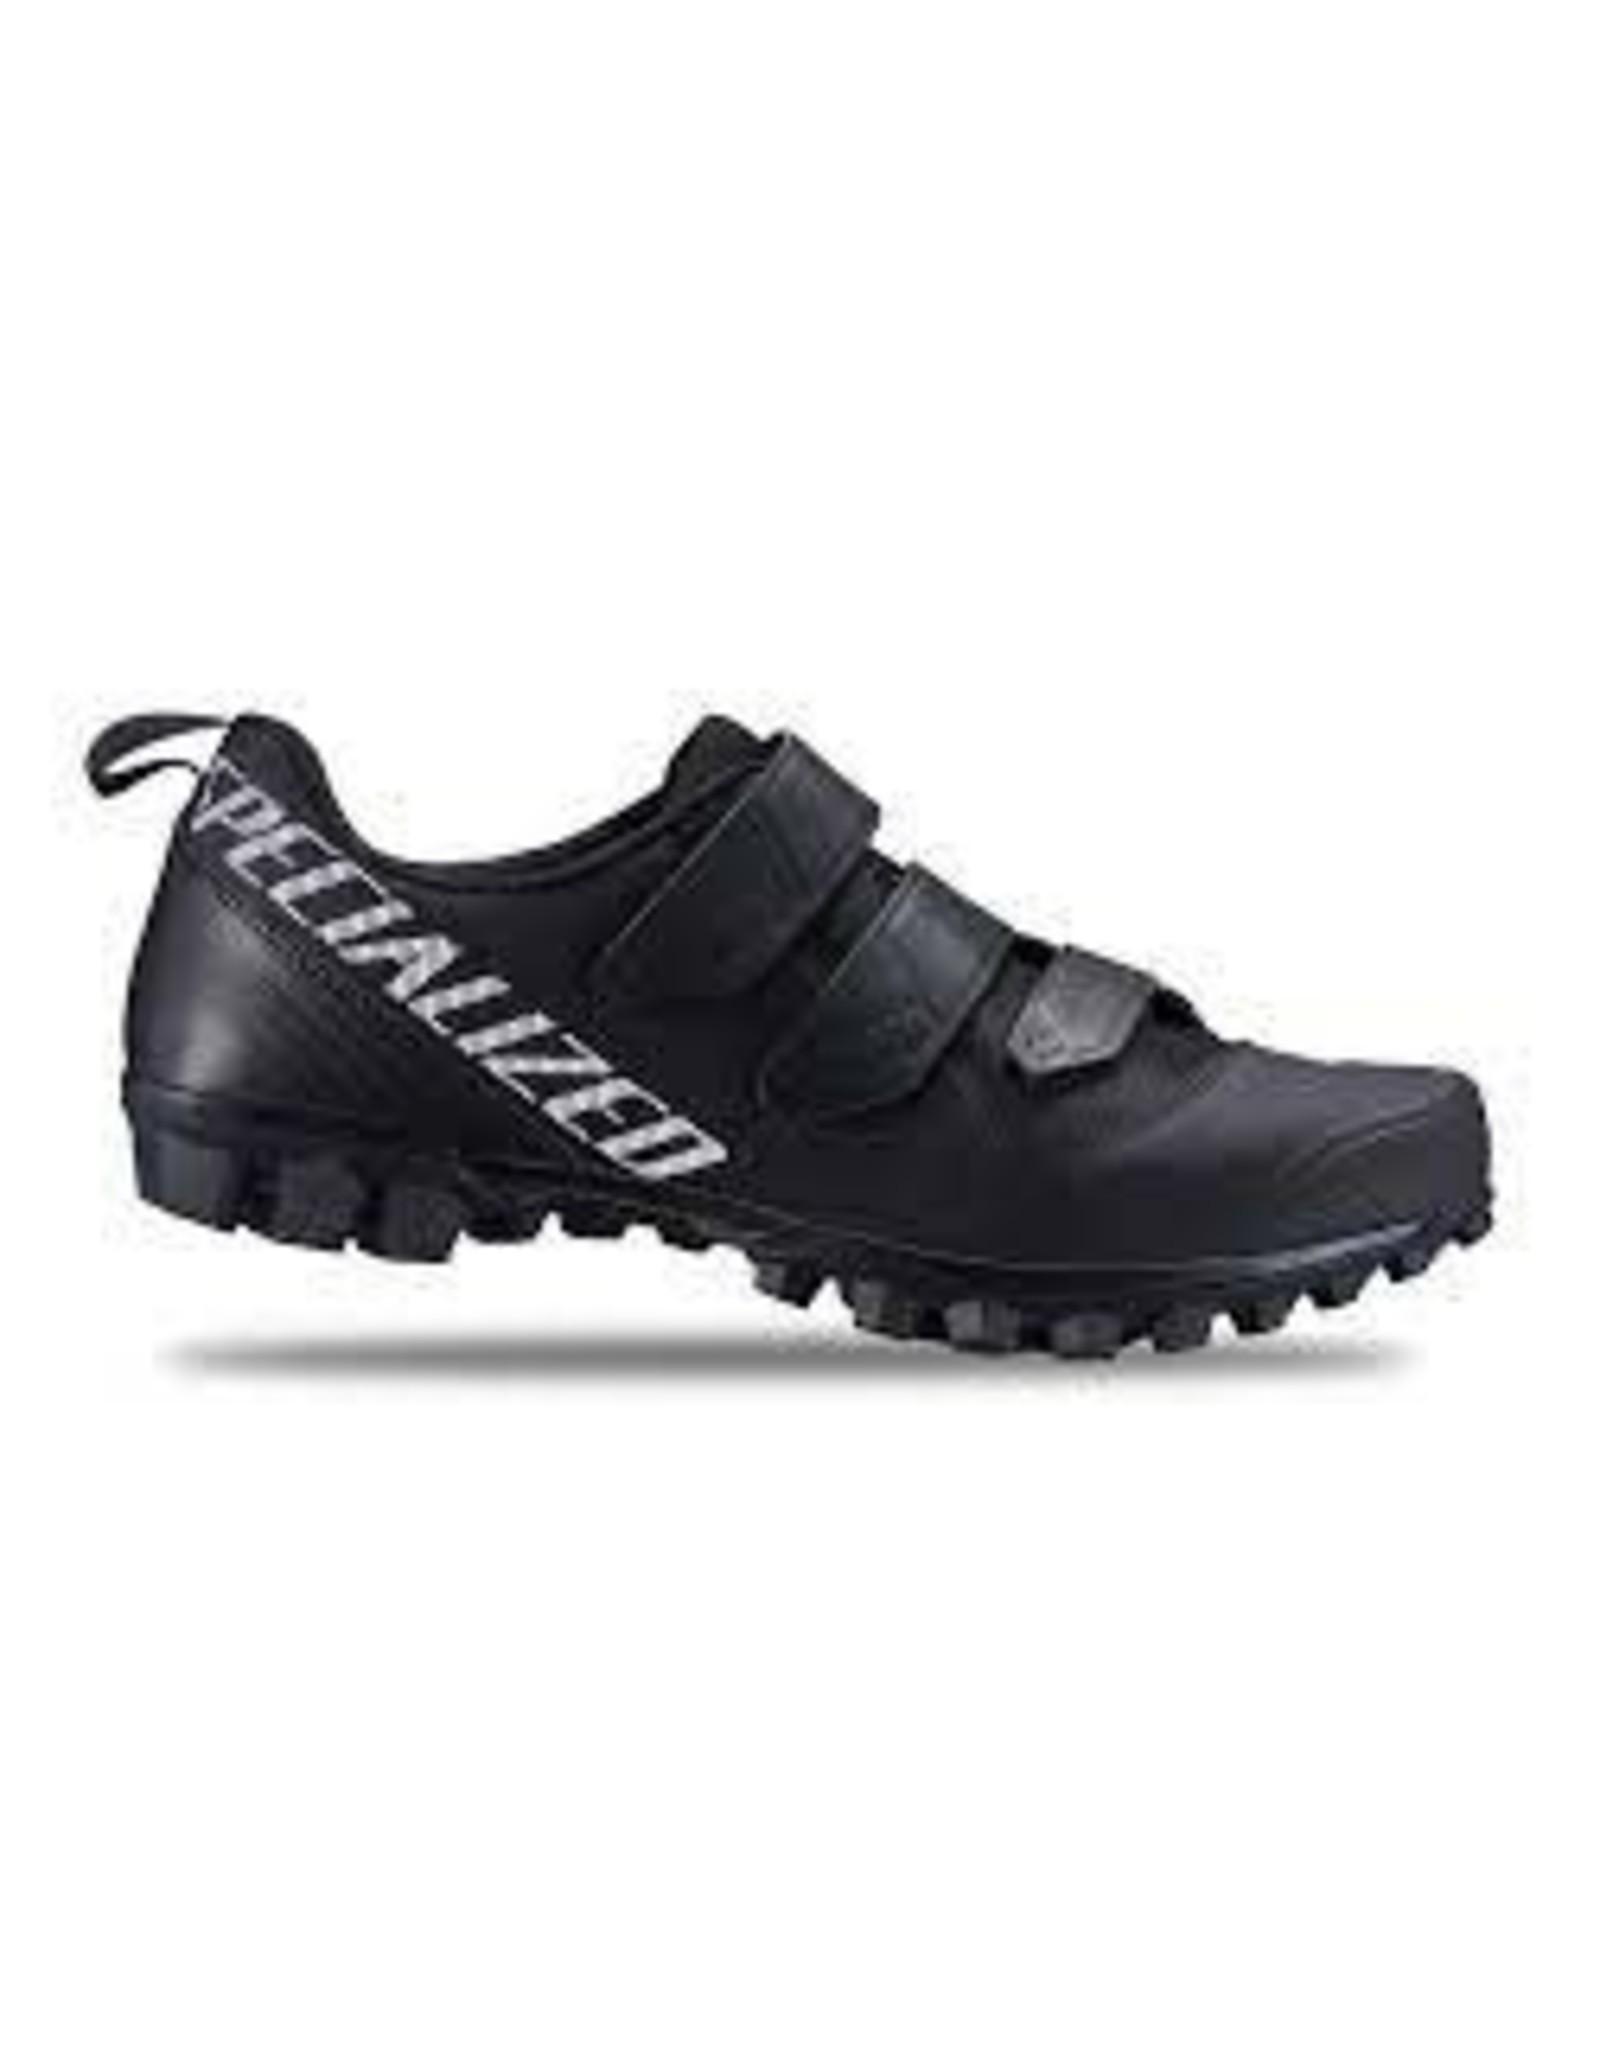 Specialized Shoe Spec Recon 1.0 Black 39